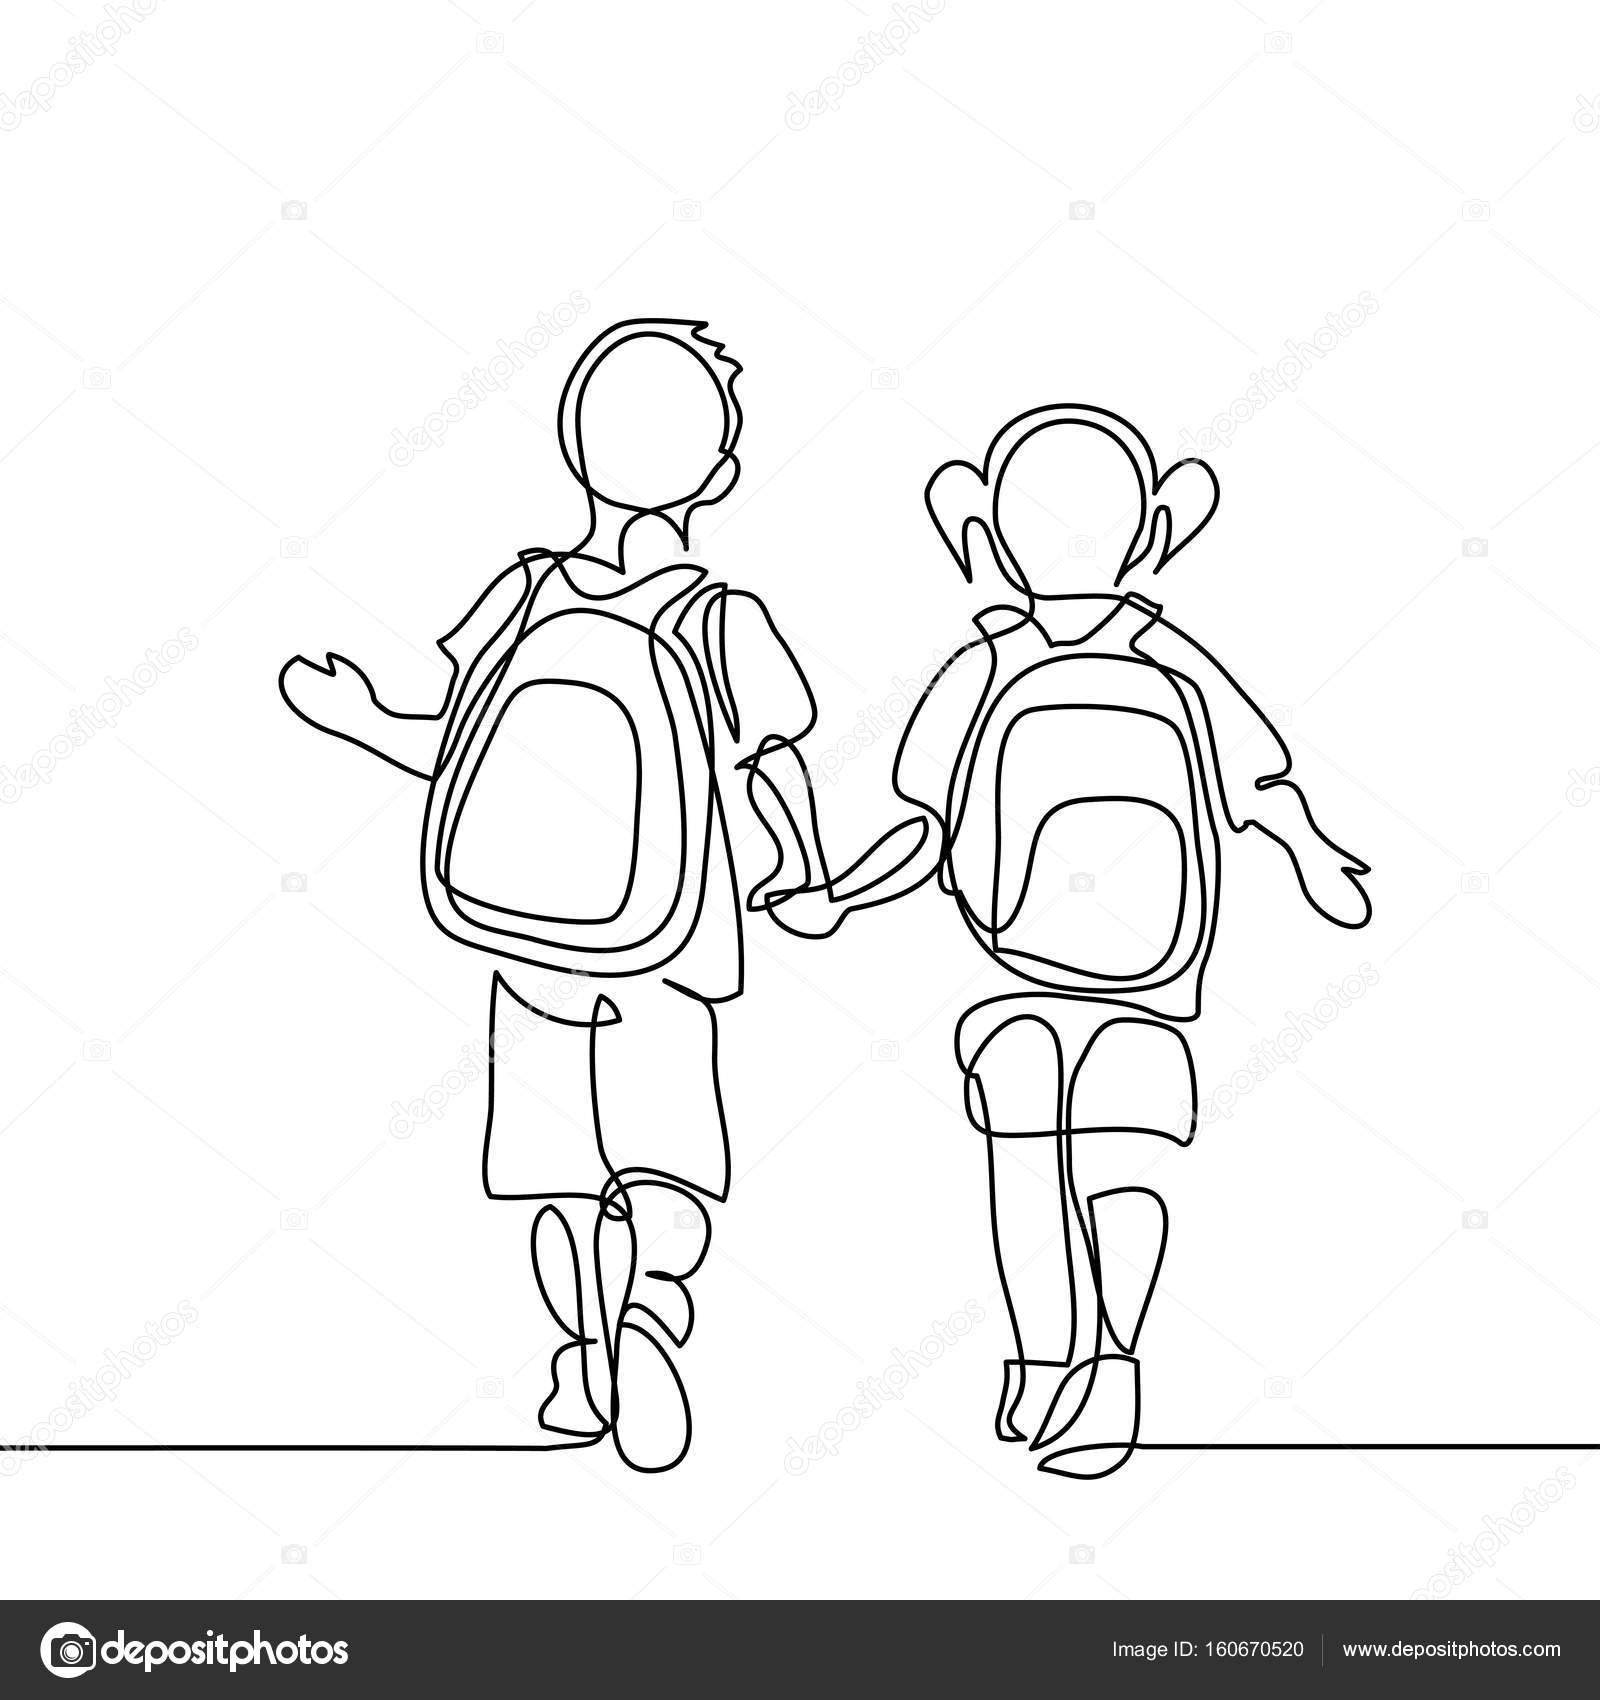 Line Art School : School line drawing at getdrawings free for personal